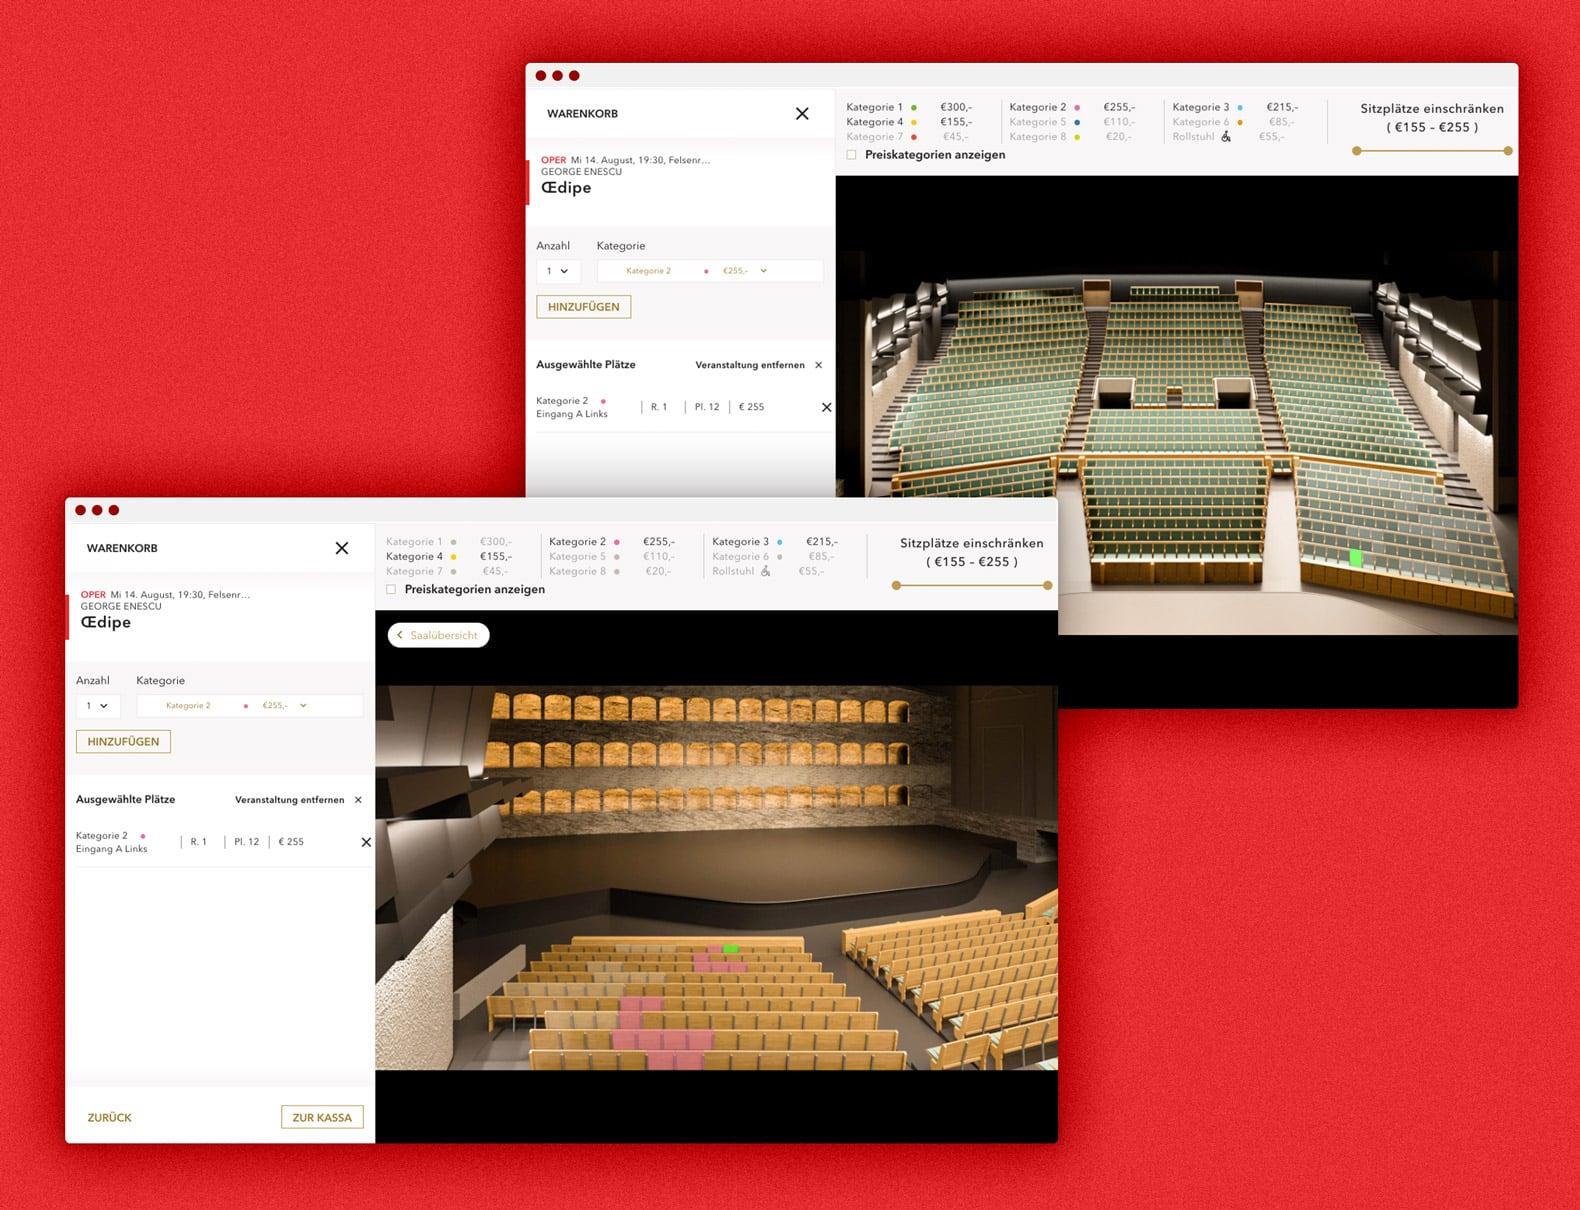 Salzburger Festspiele Website Desktop Oedipe Platzauswahl